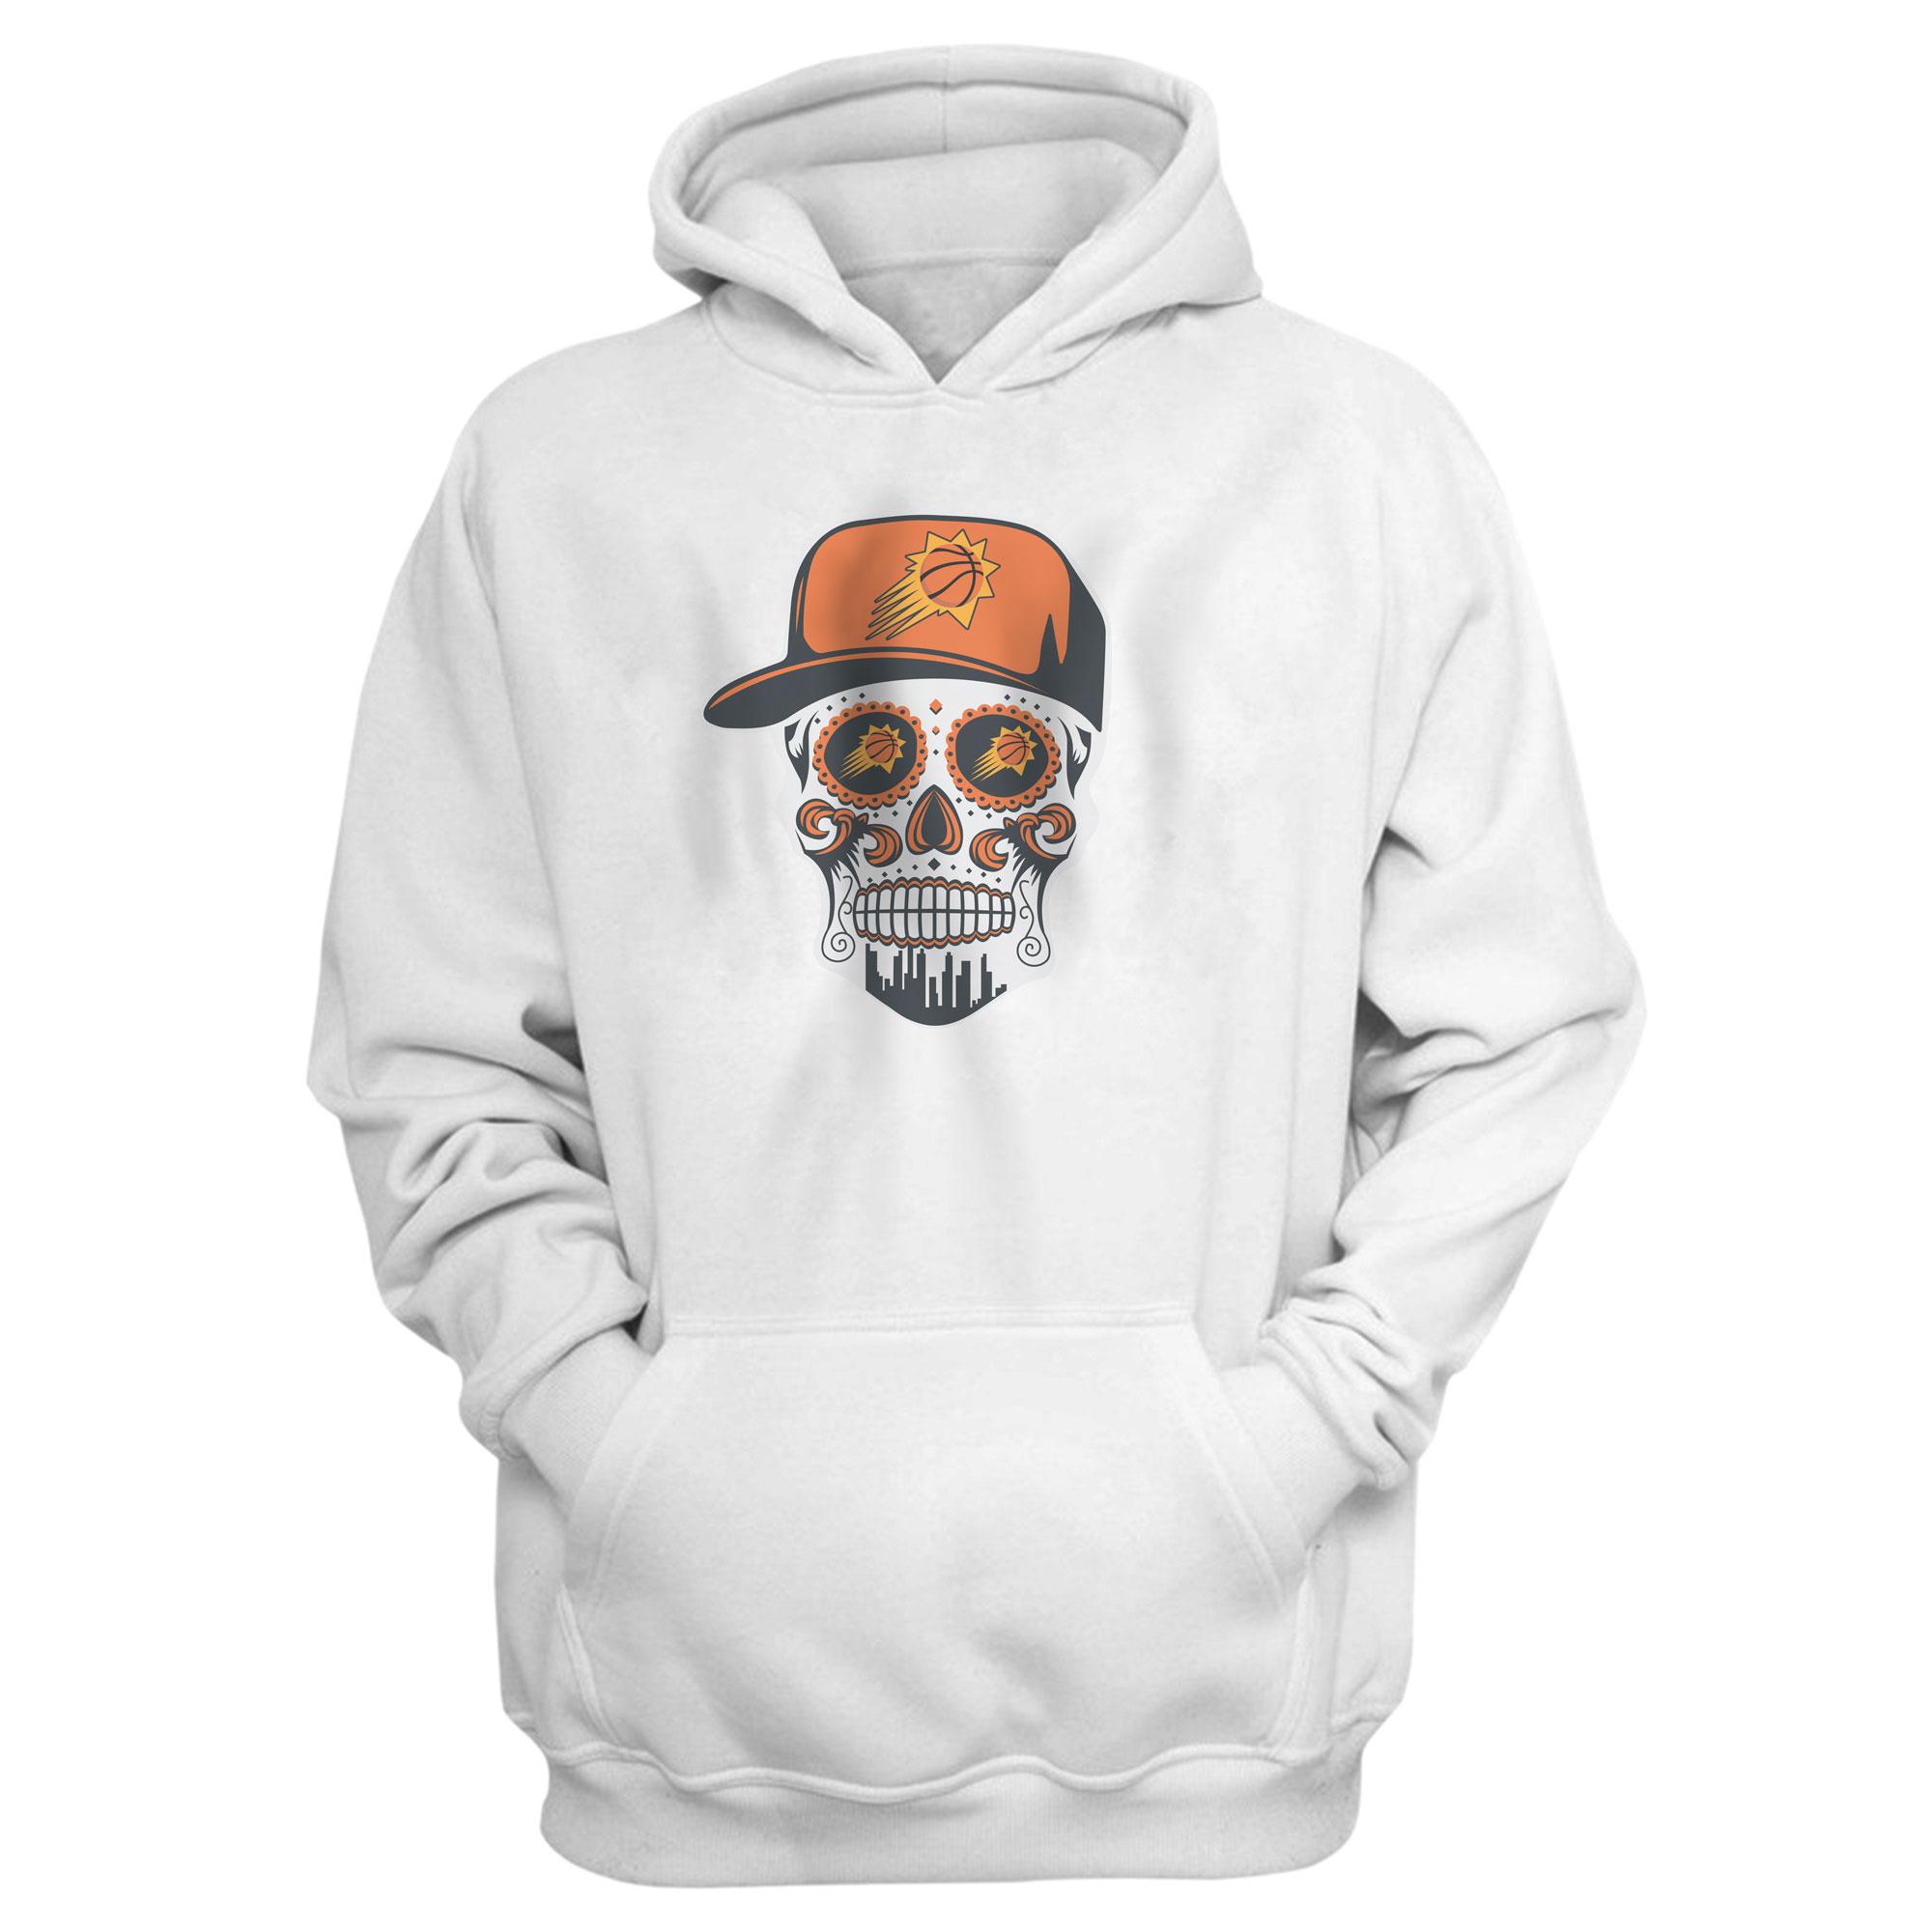 Phoenix Skull Hoodie (HD-WHT-NP-461-NBA-PHO-PHO-SKULL)